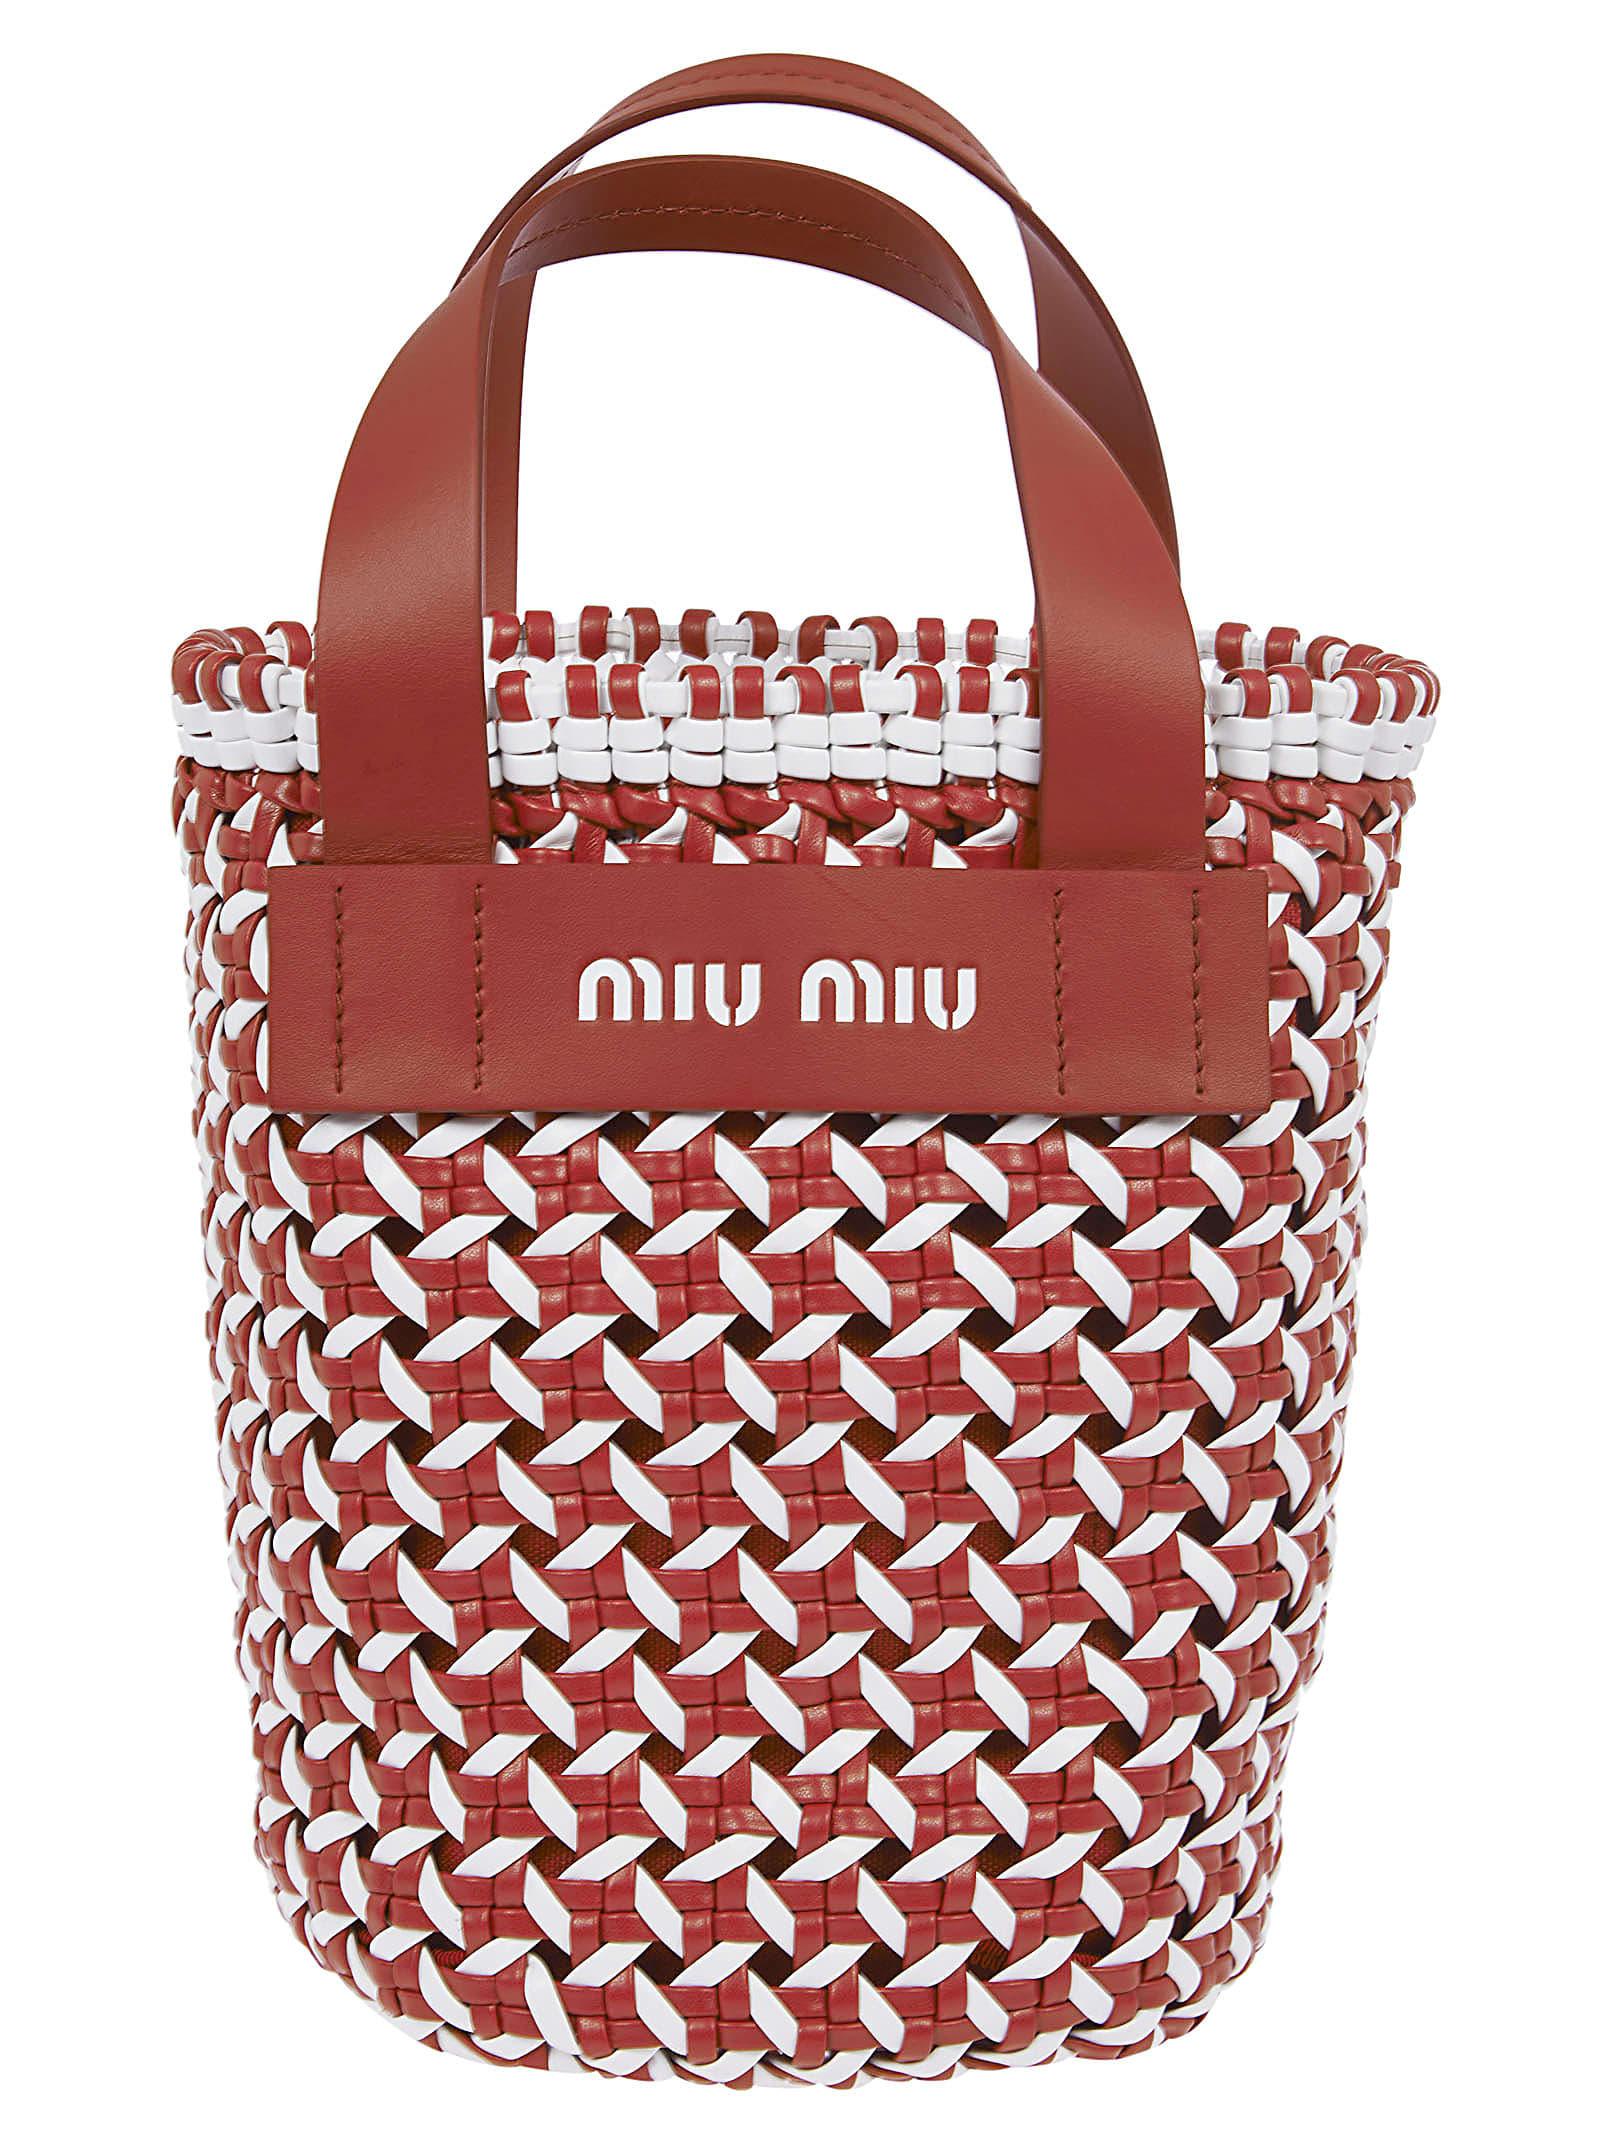 Miu Miu Logo Weaved Tote